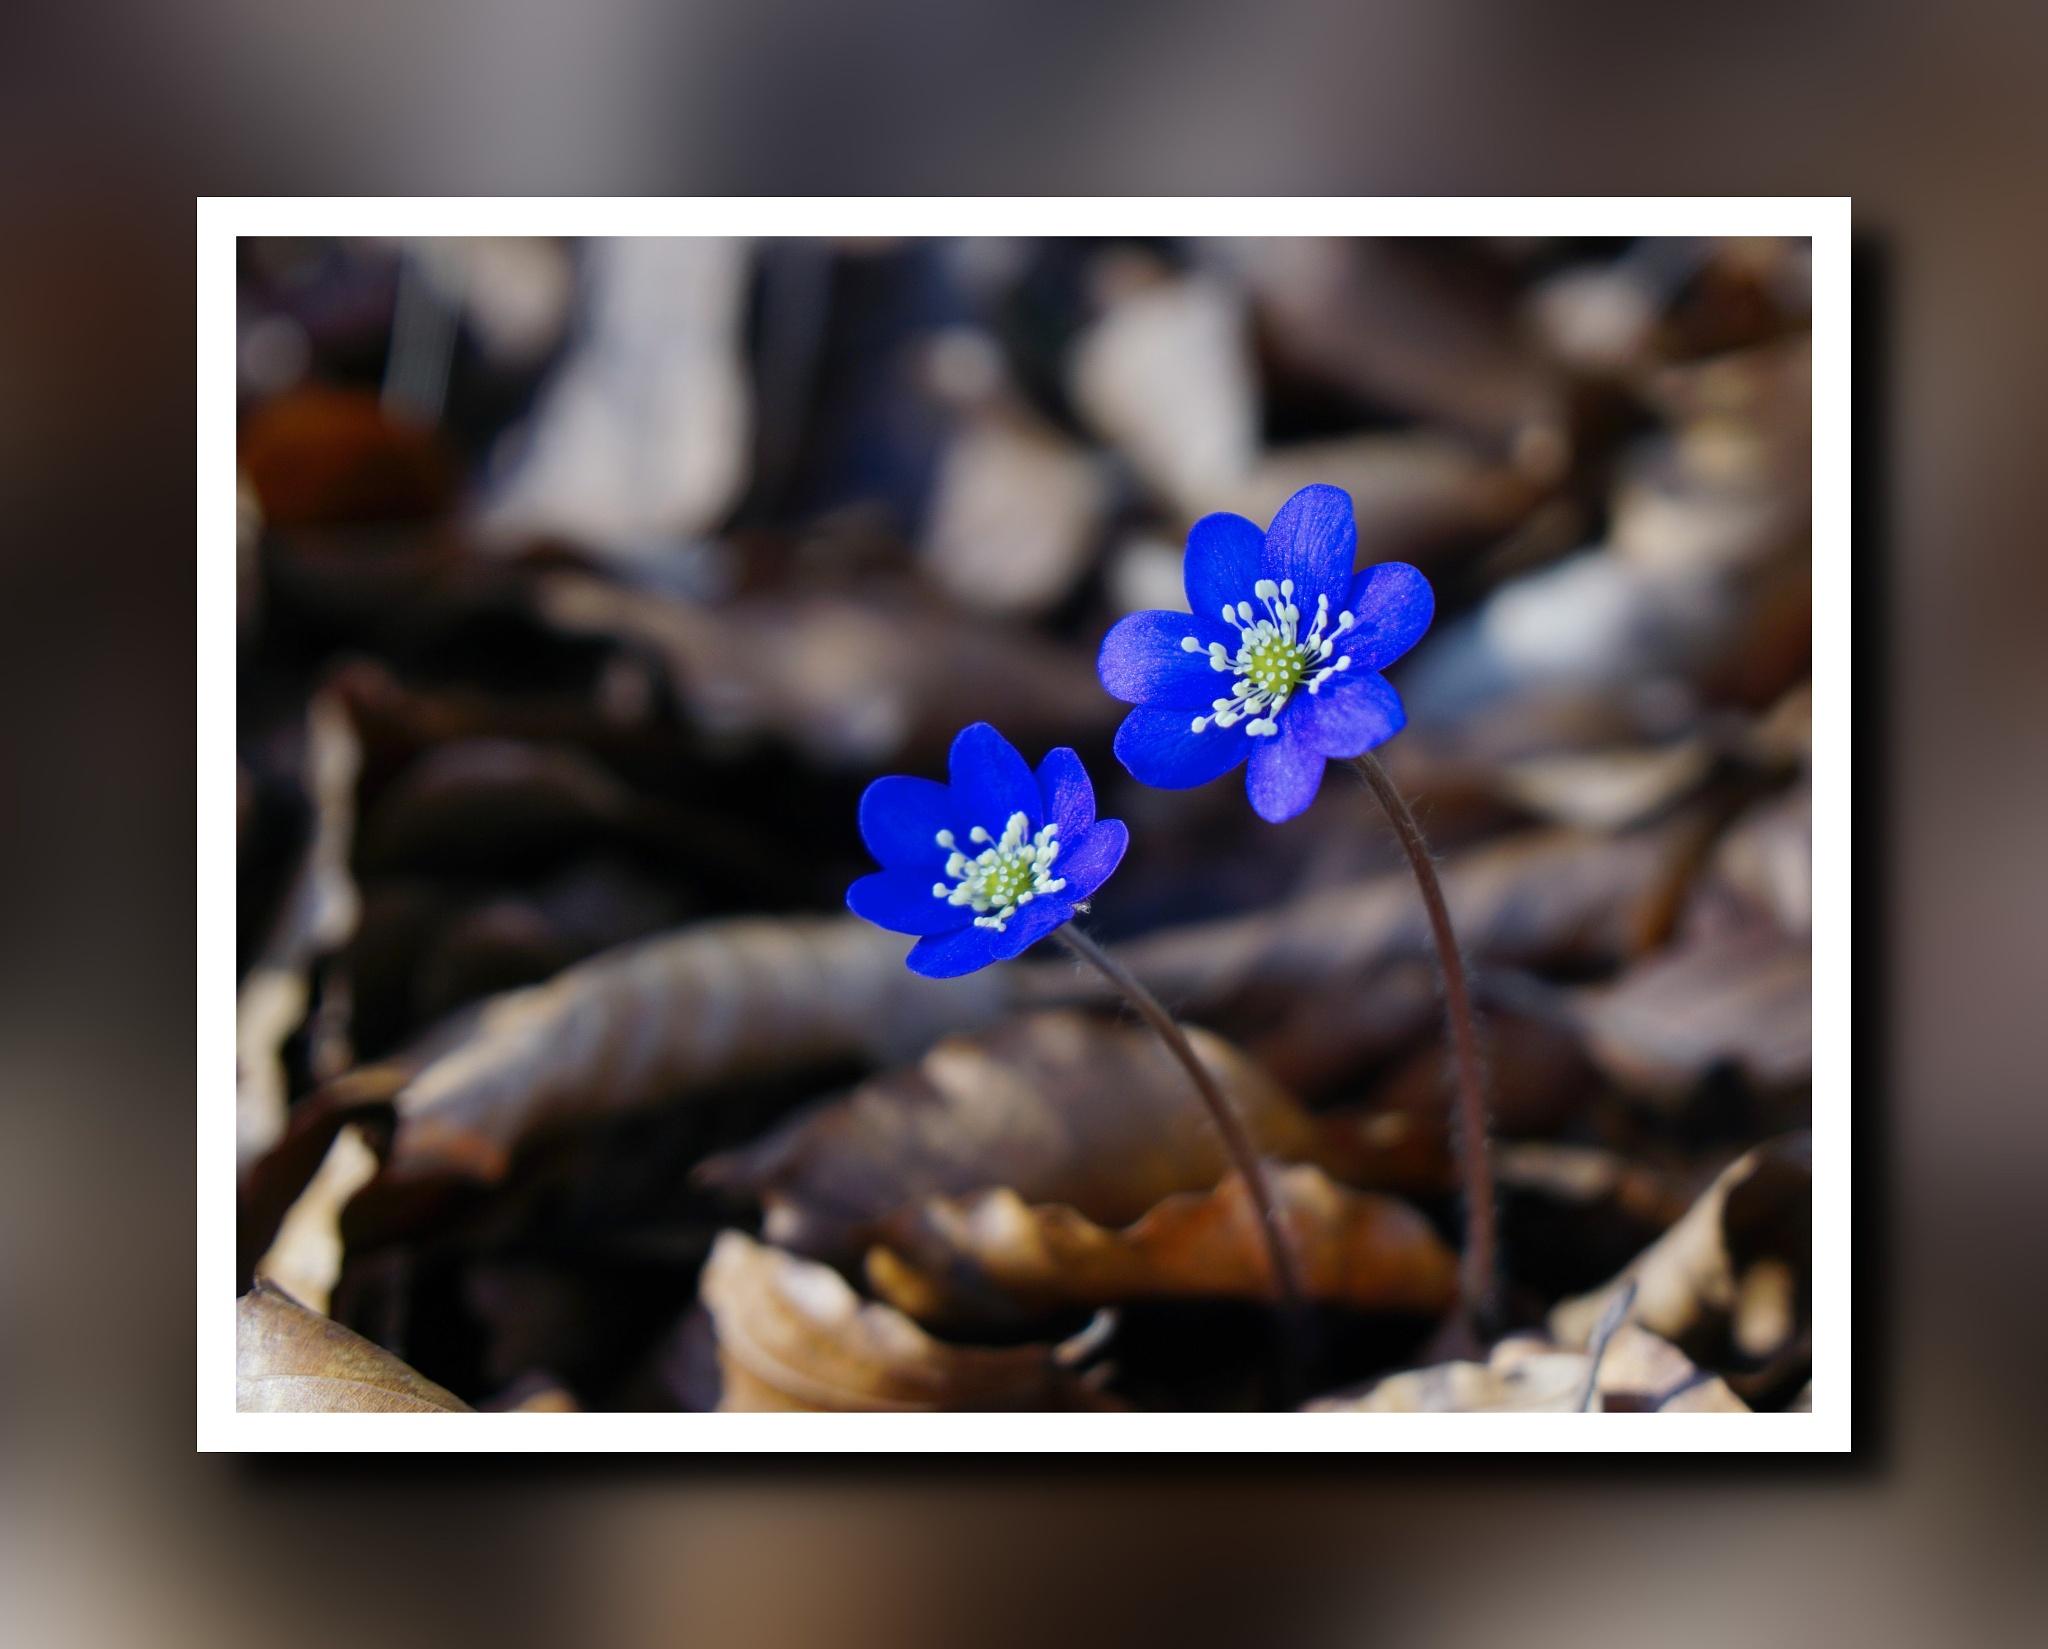 Blue anemones by Dorte Hedengran